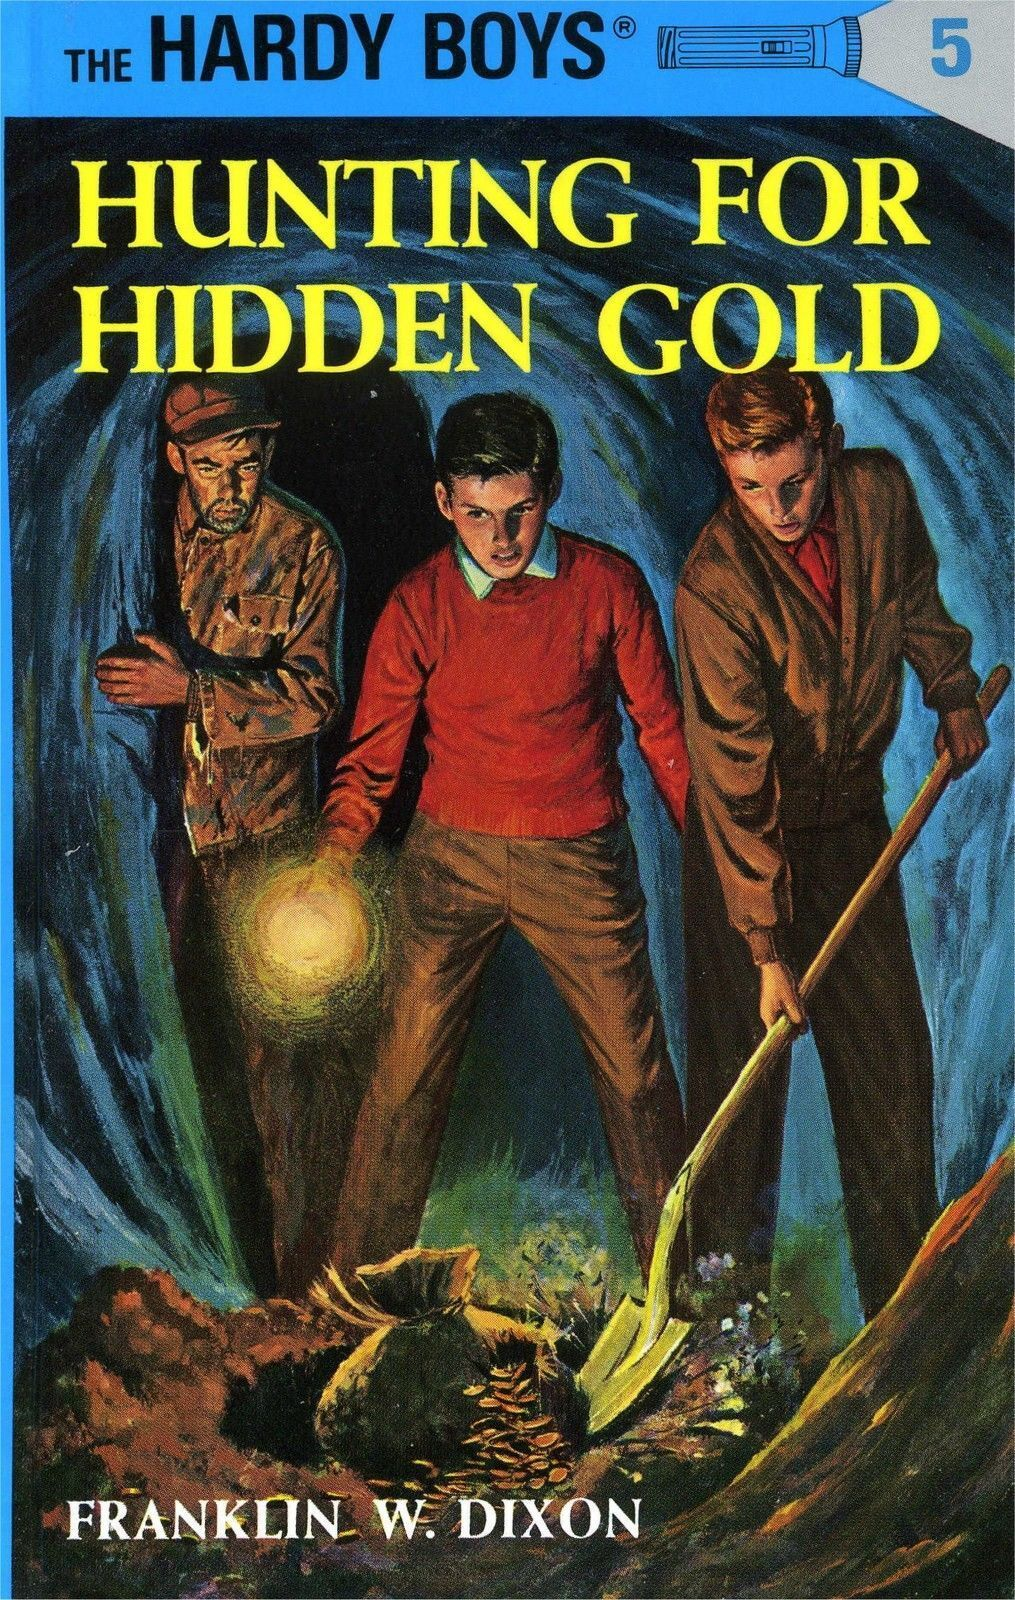 BOOK - THE HARDY BOYS - THE HOODED HAWK MYSTERY - NO. 34 - CR 1954